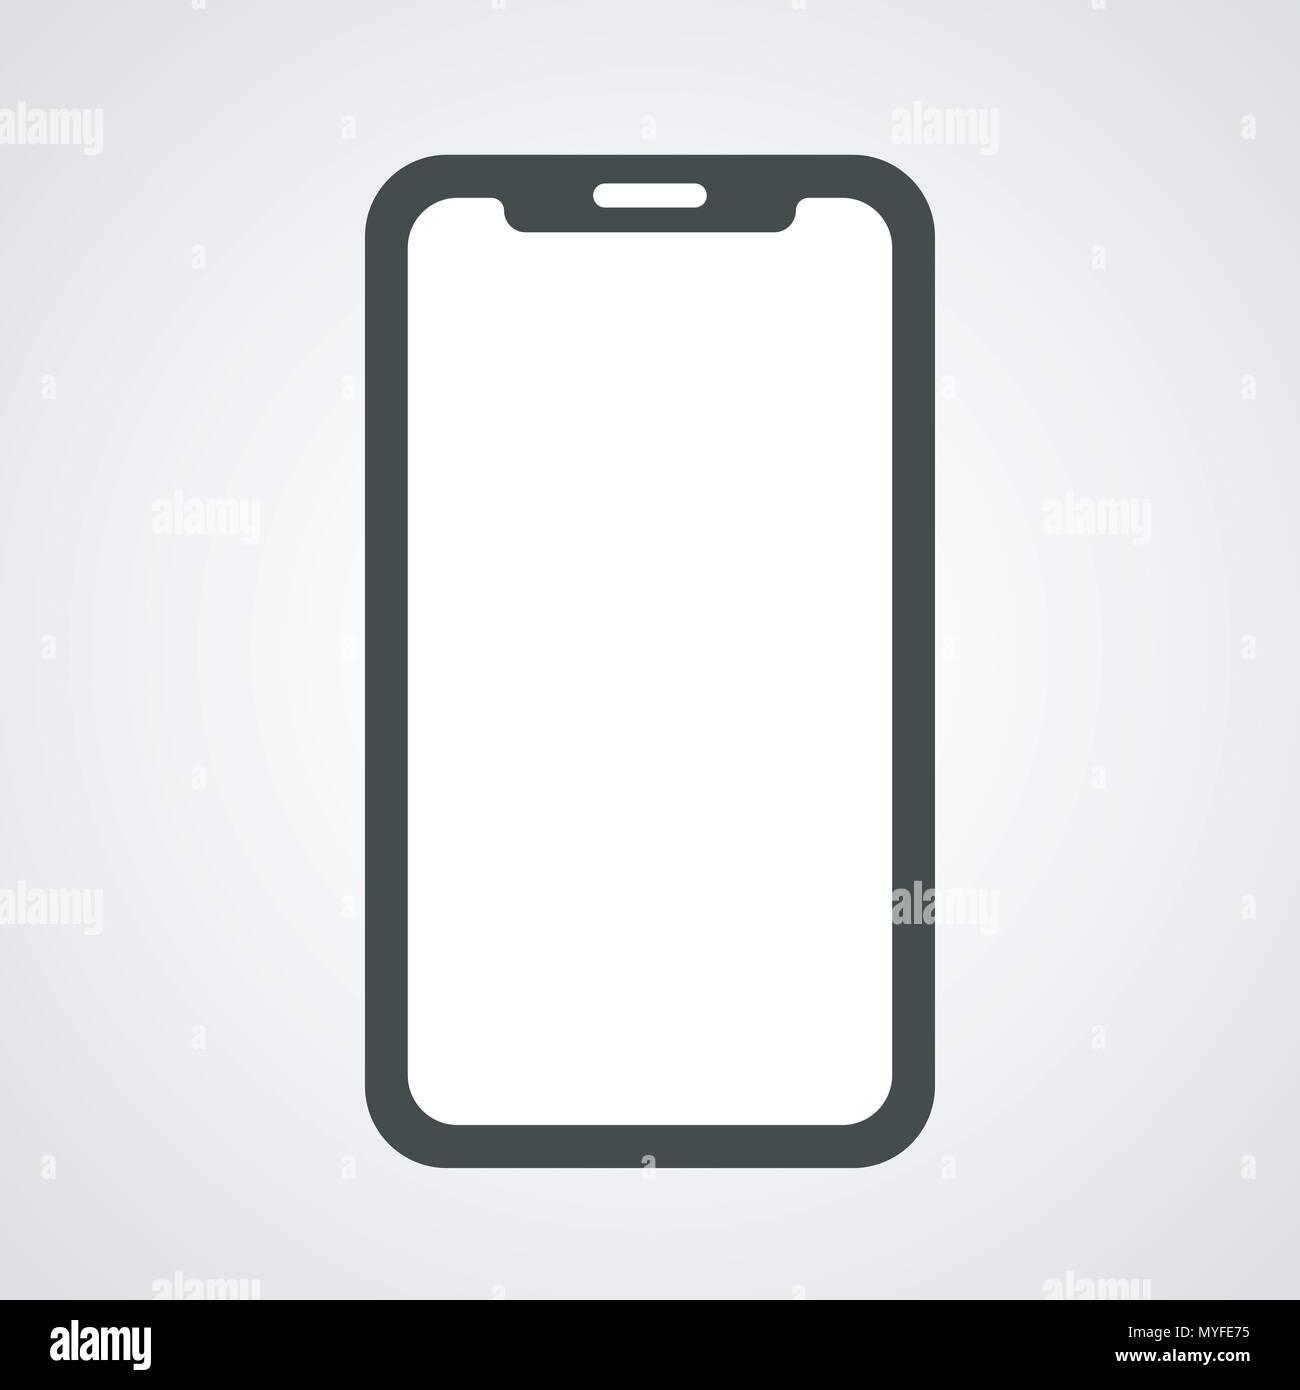 Vector Design Of Phone Blank Template Stock Vector Art